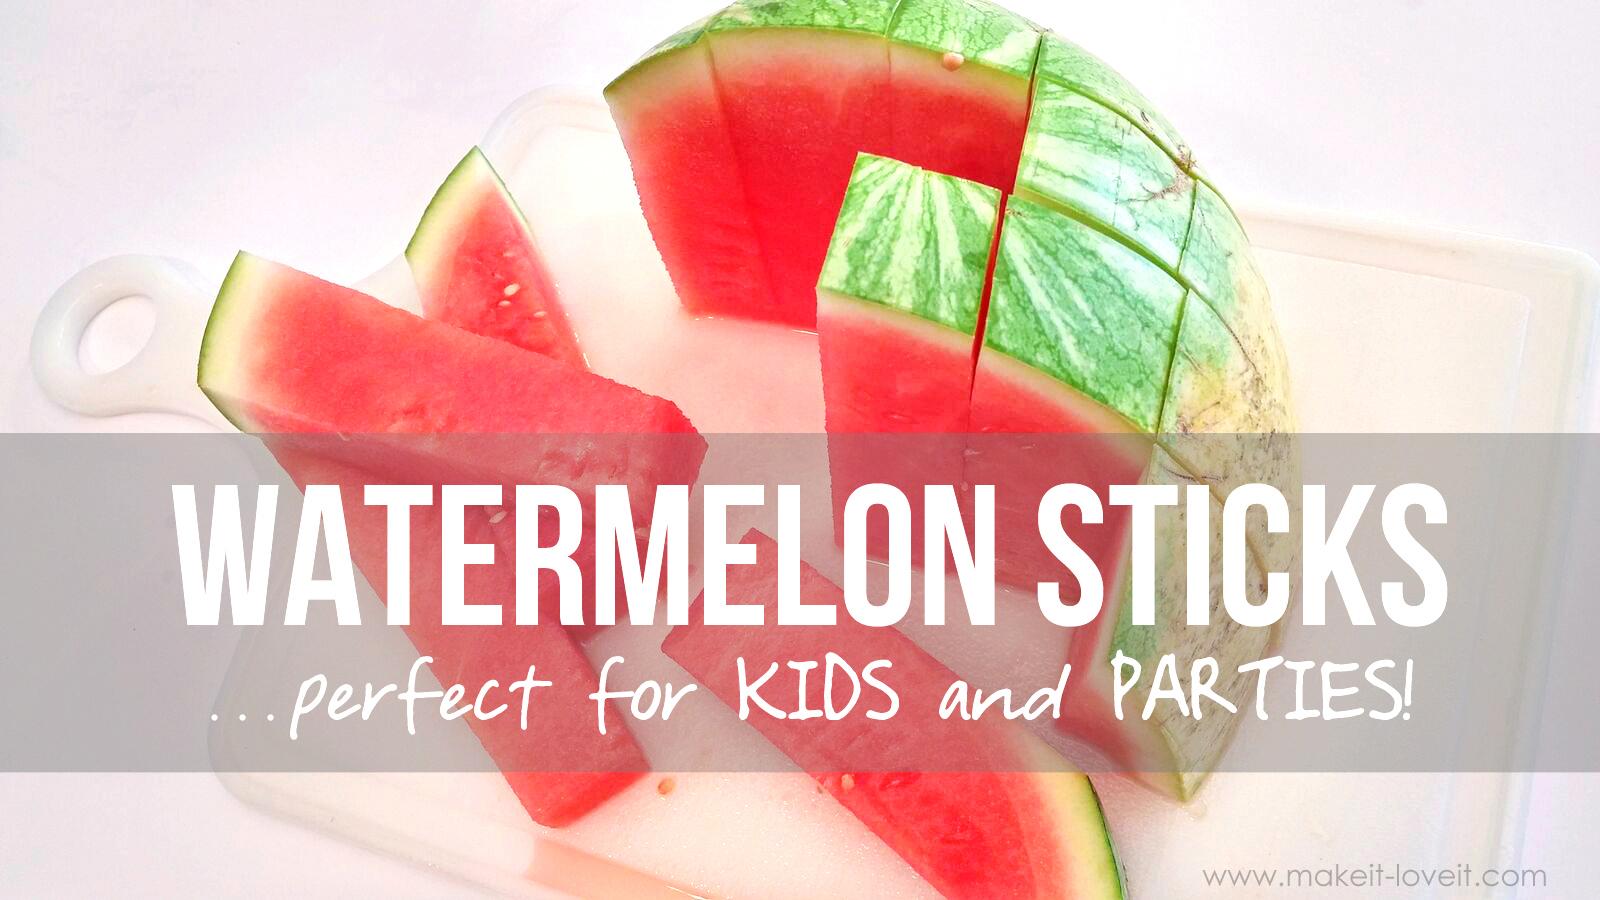 watermelon-sticks-FINAL-2